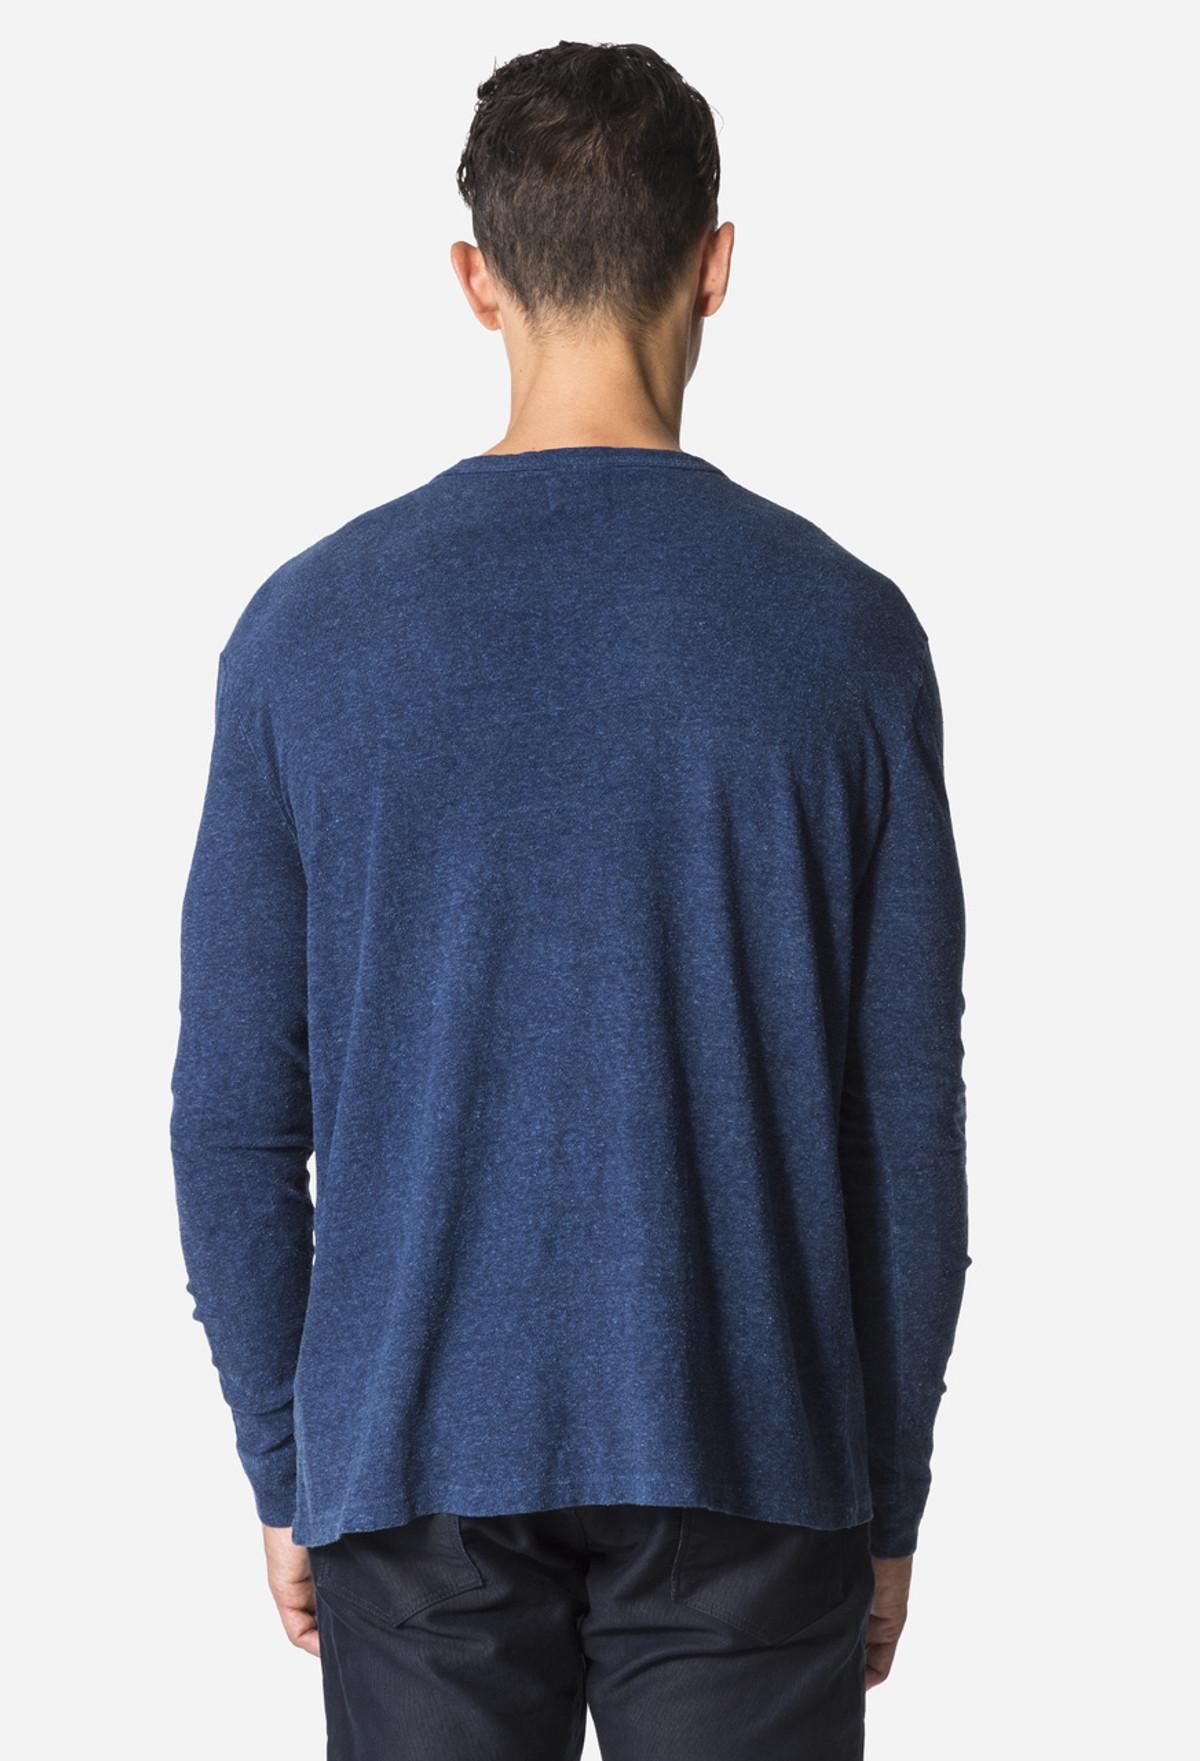 Indigo LS Crew Neck T-Shirt